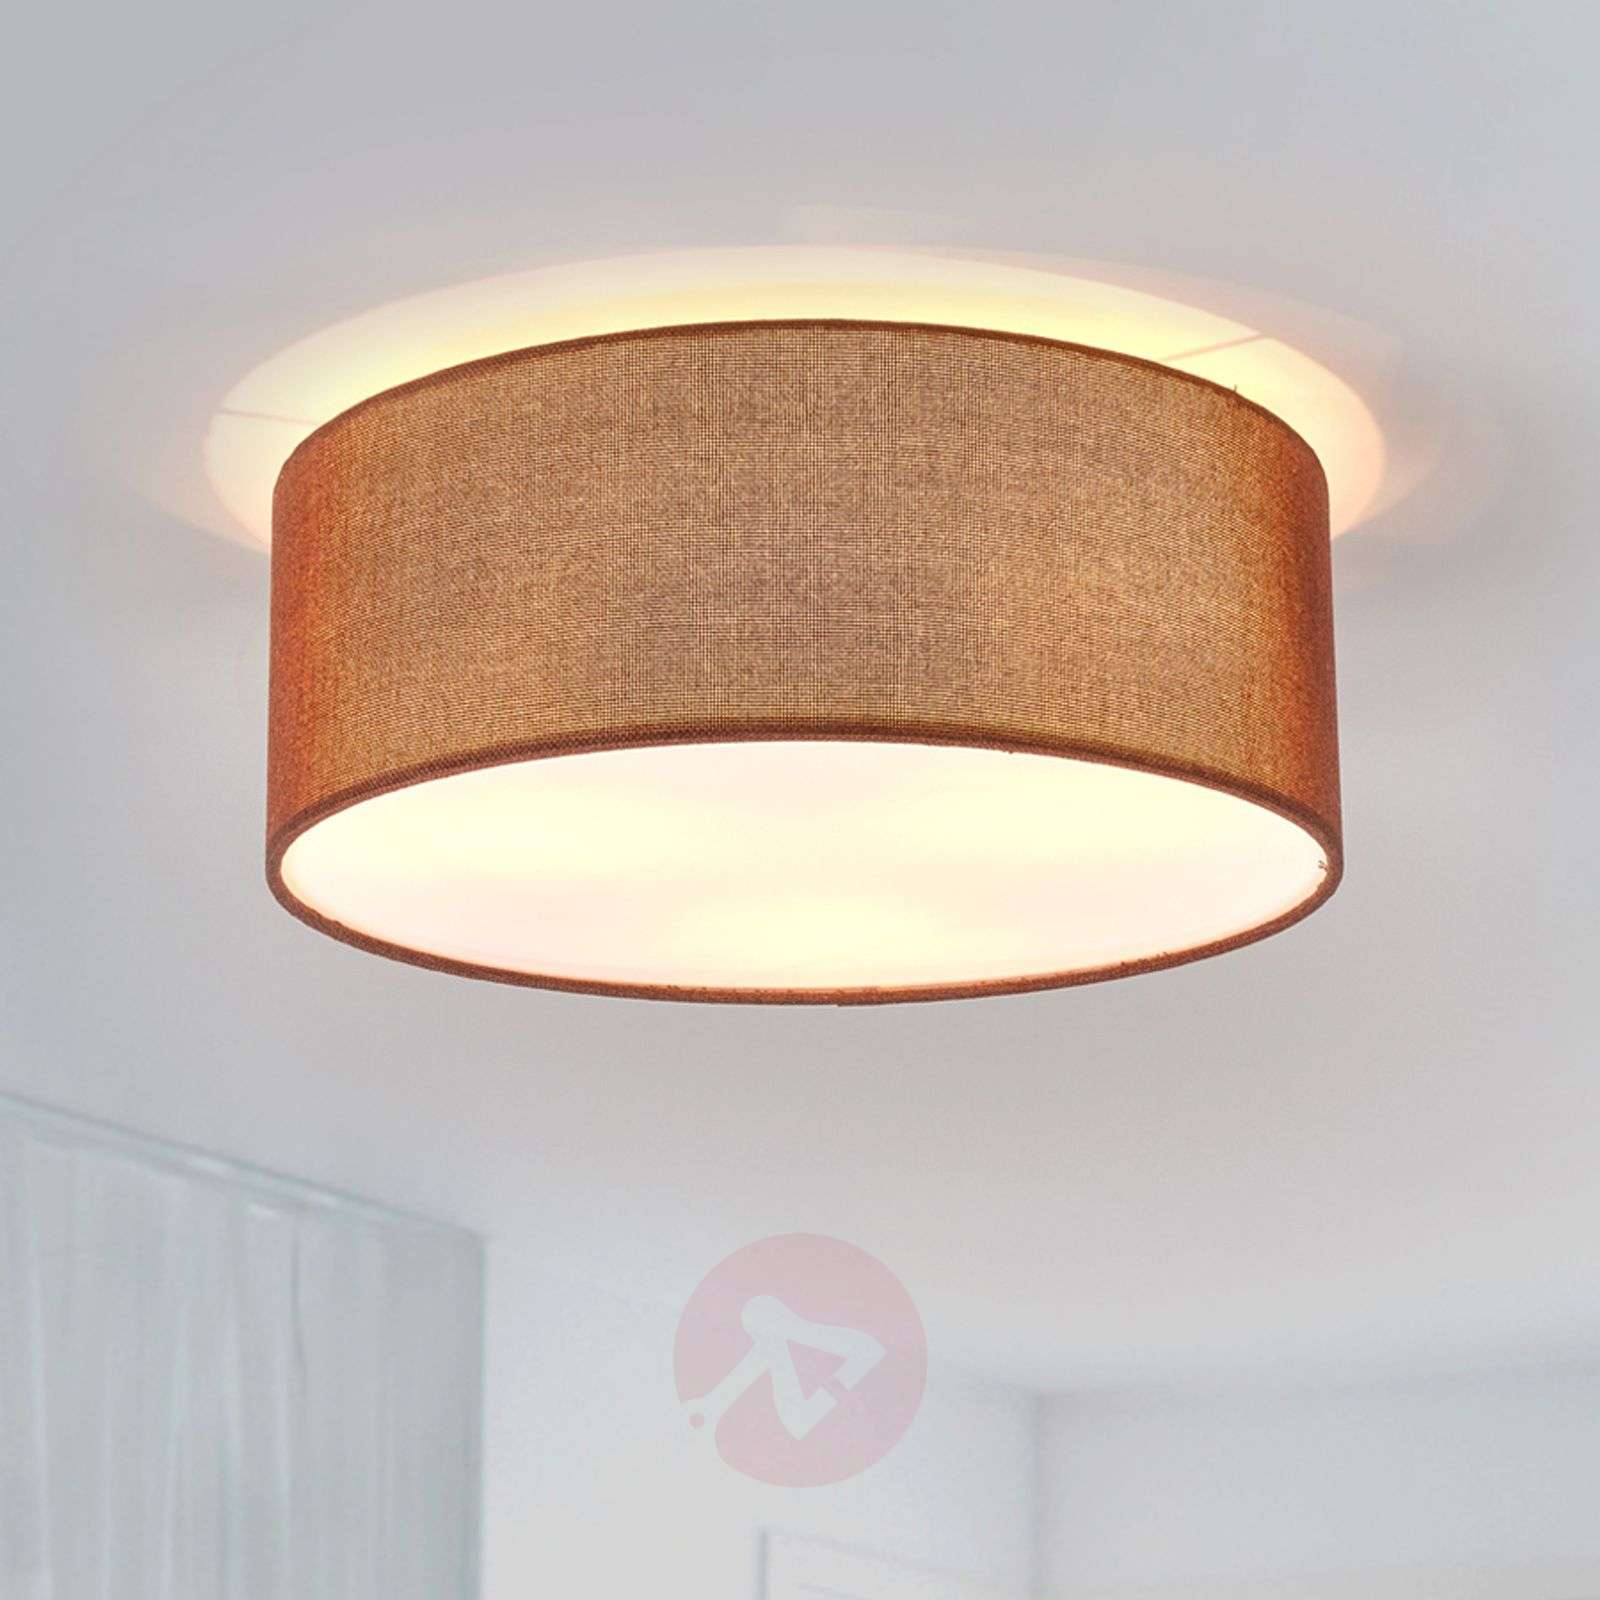 Round, brown Henrika fabric ceiling light-4018019-05